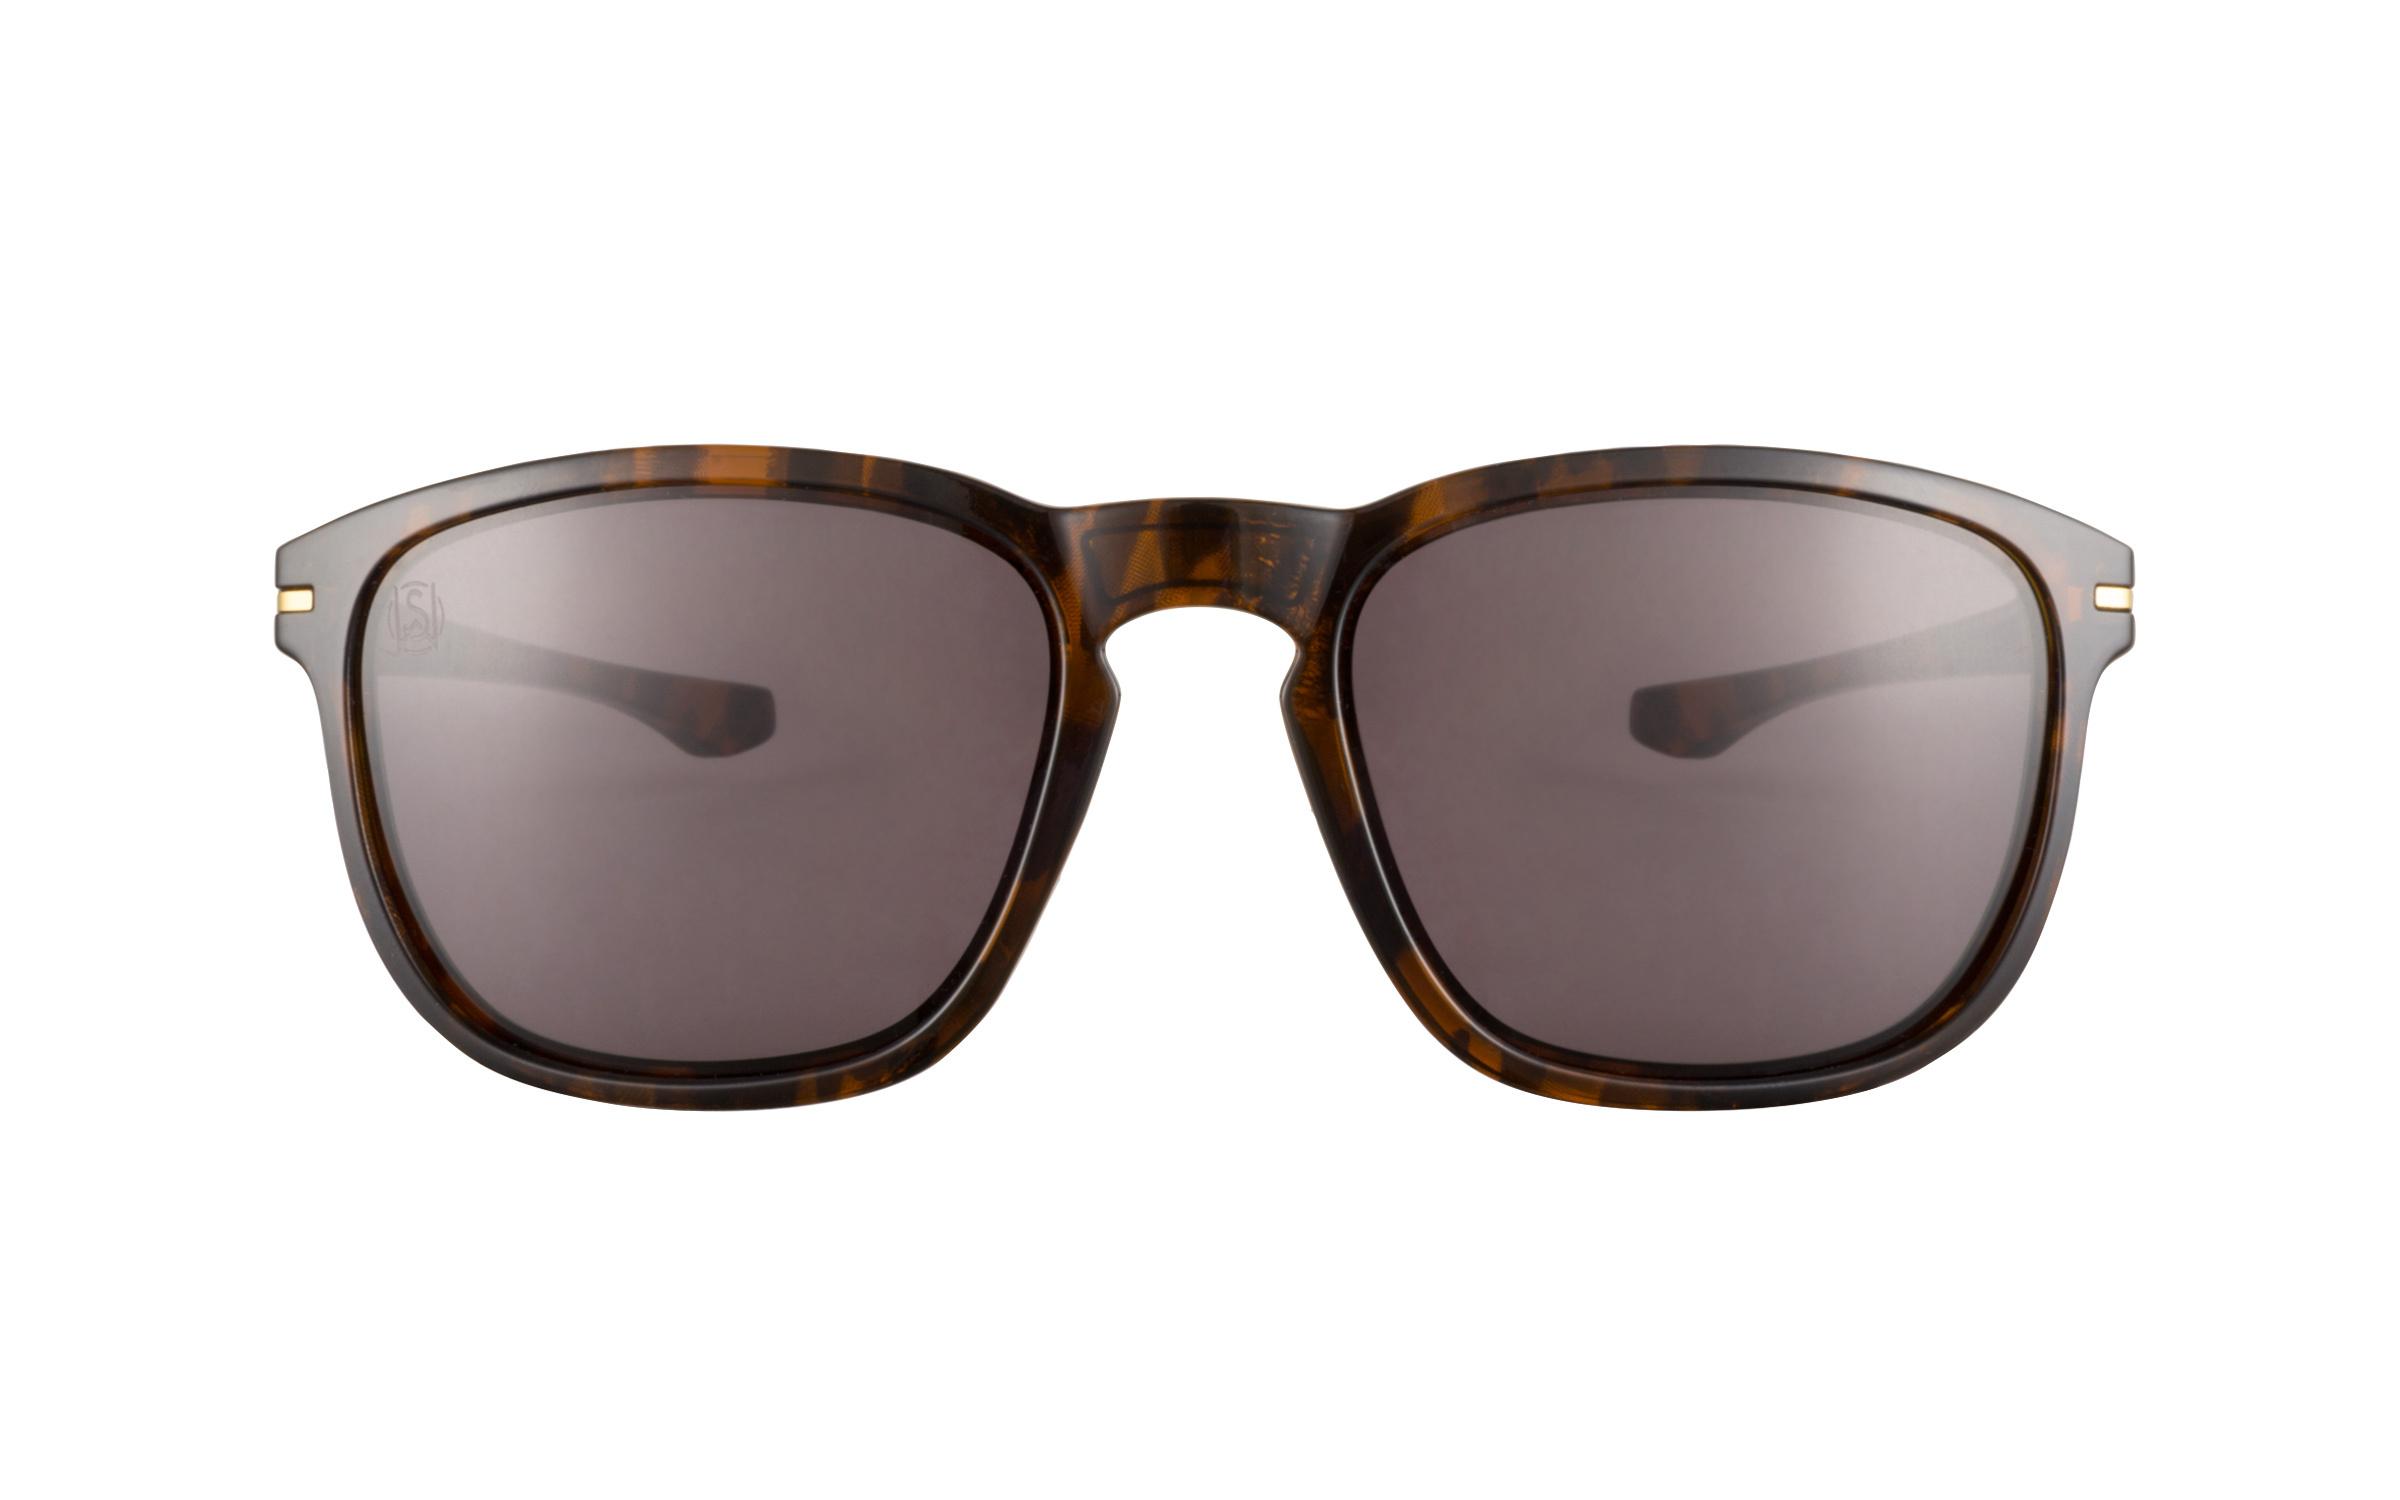 Oakley Enduro 9223 02 Brown Tortoise Sunglasses